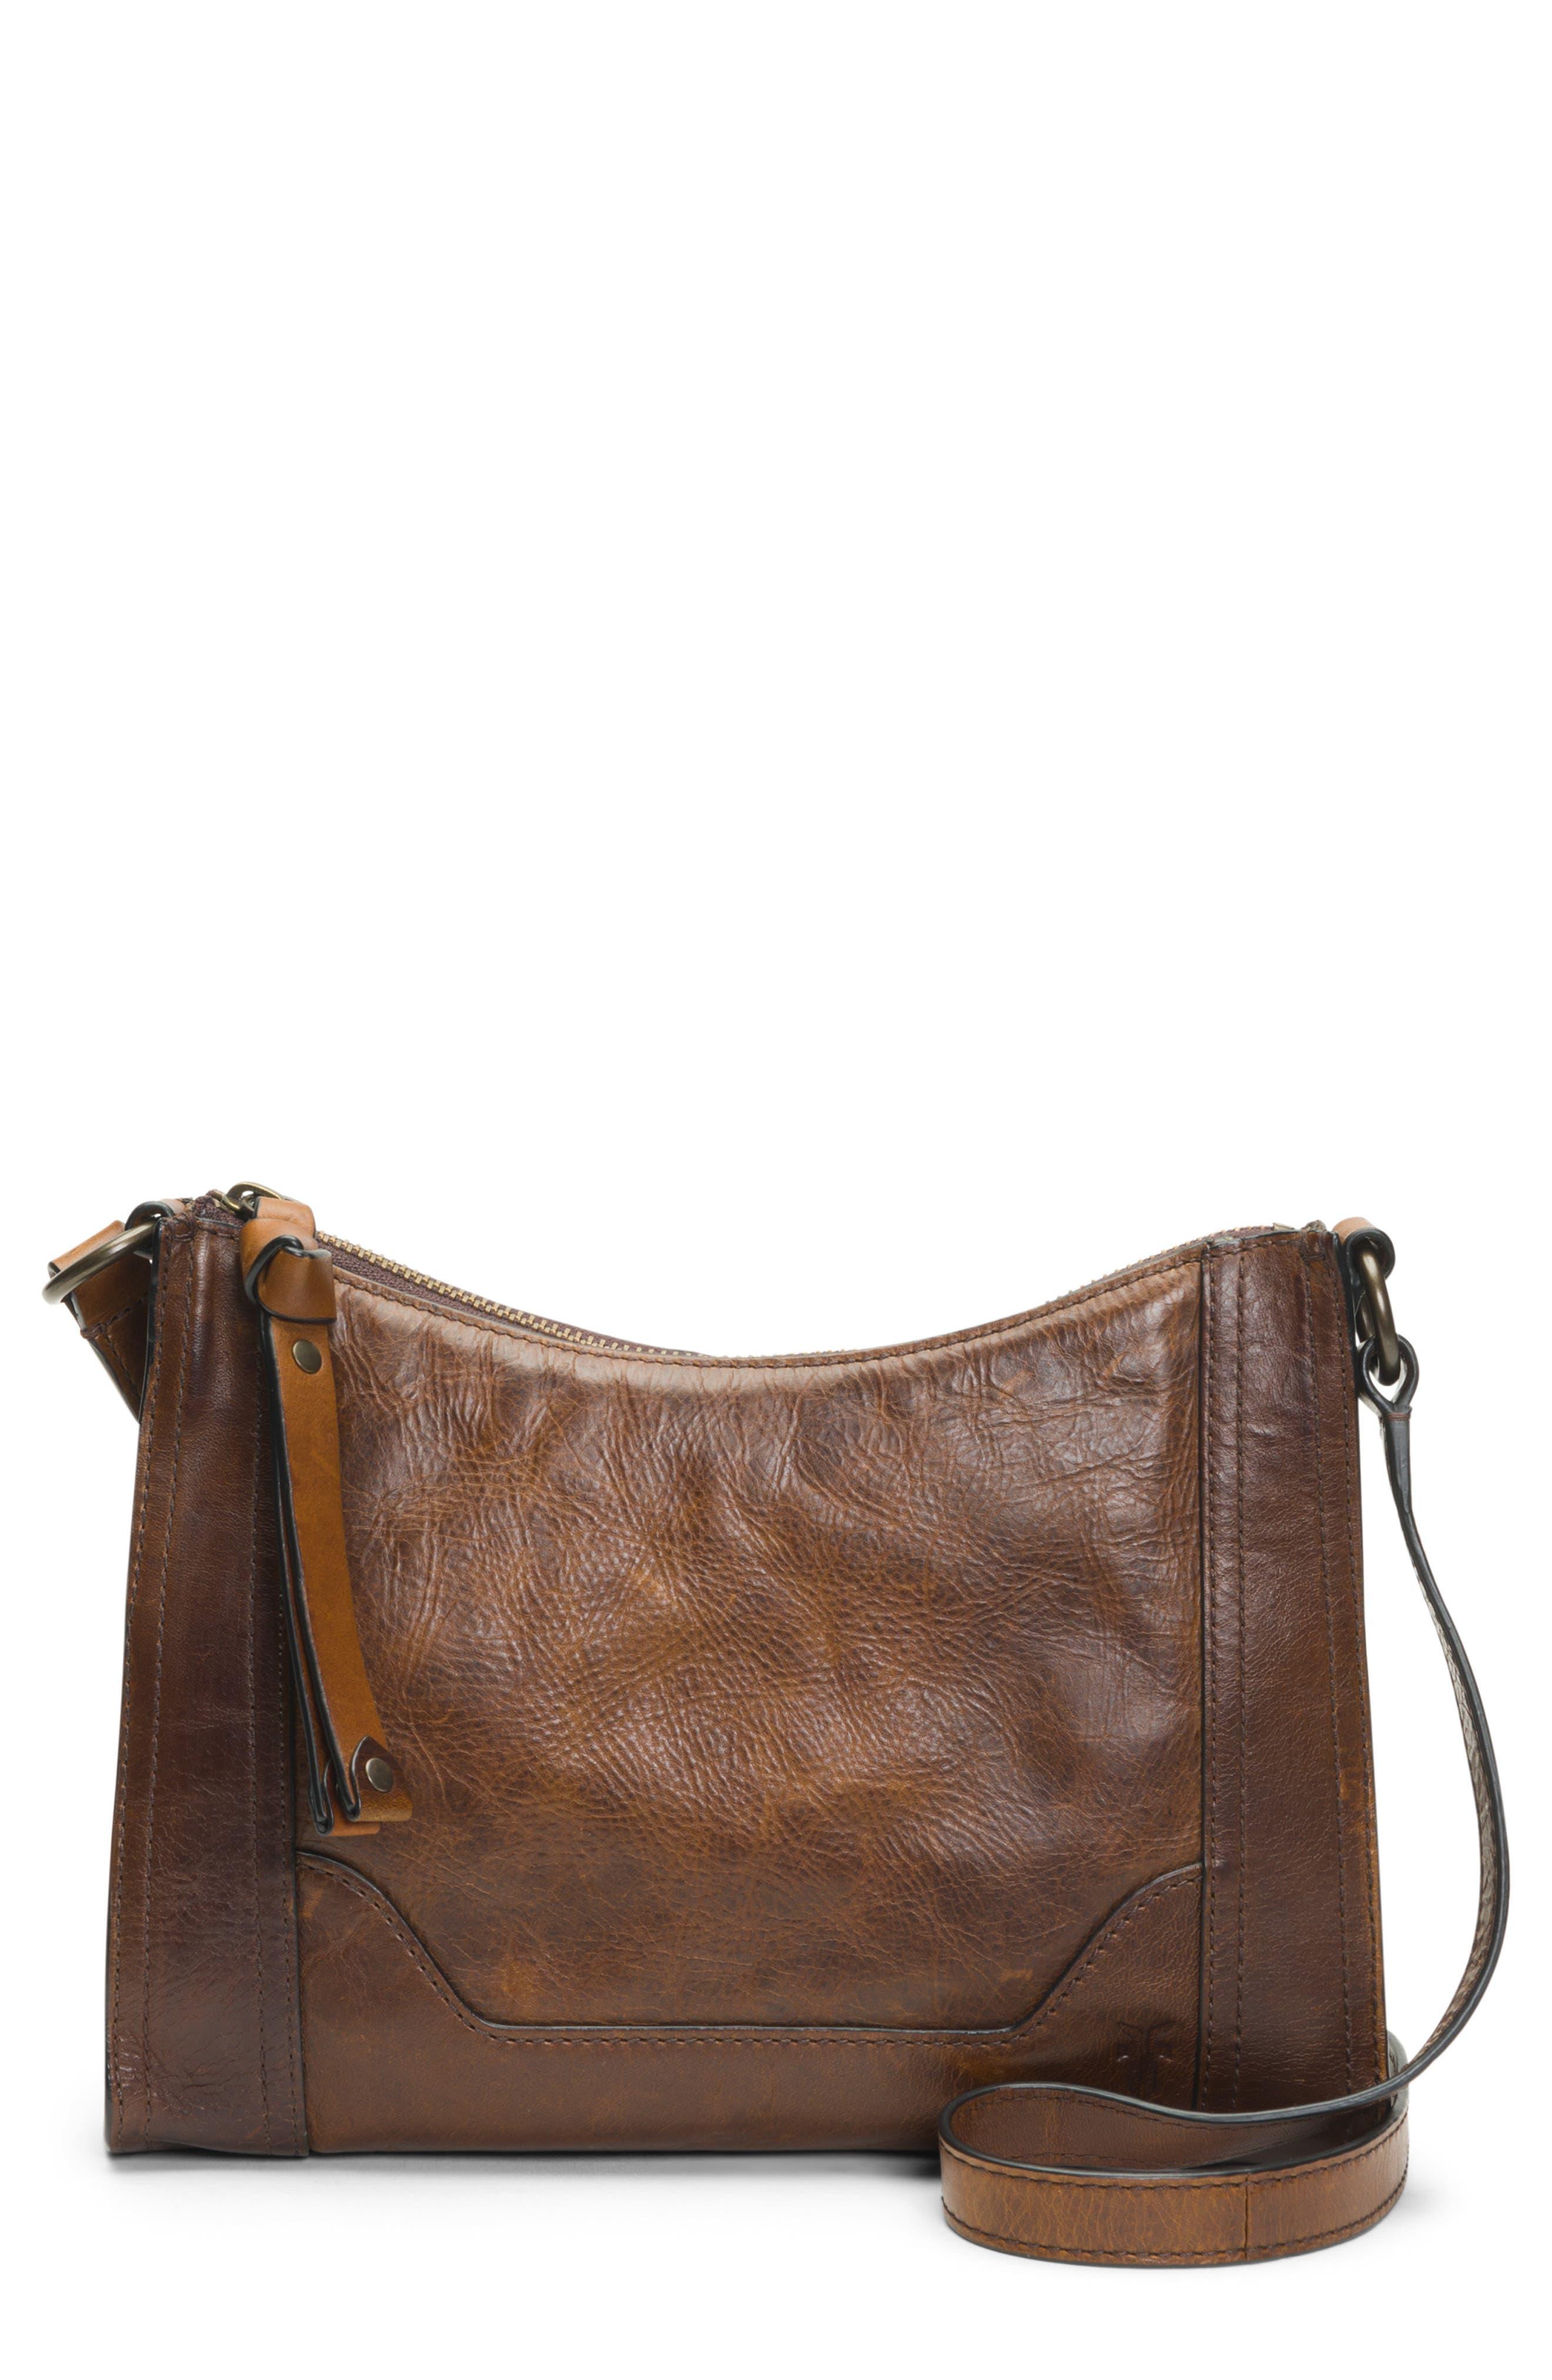 Melissa Leather Crossbody Bag,                             Main thumbnail 1, color,                             DARK BROWN